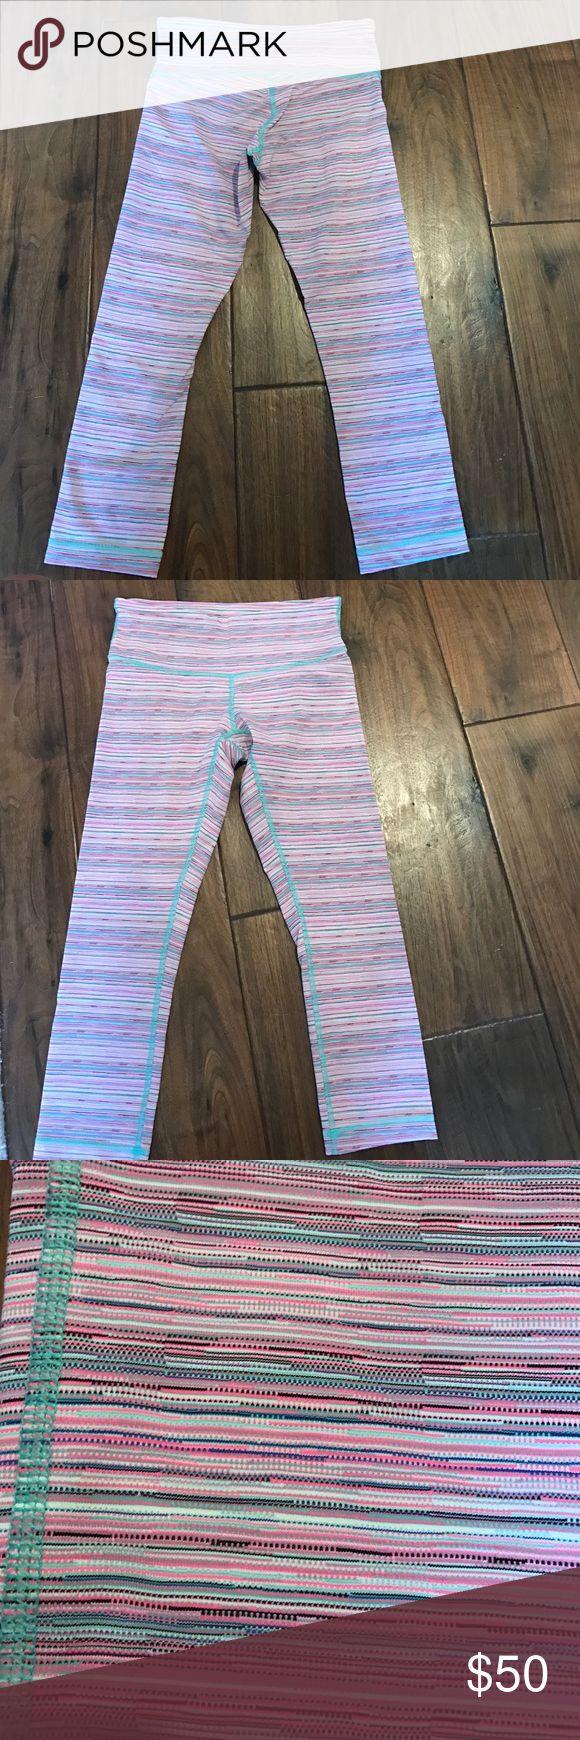 Patterned size 6 cropped lululemon pants pink striped patterned lululemon pants size 6 cropped never worn lululemon athletica Pants Leggings